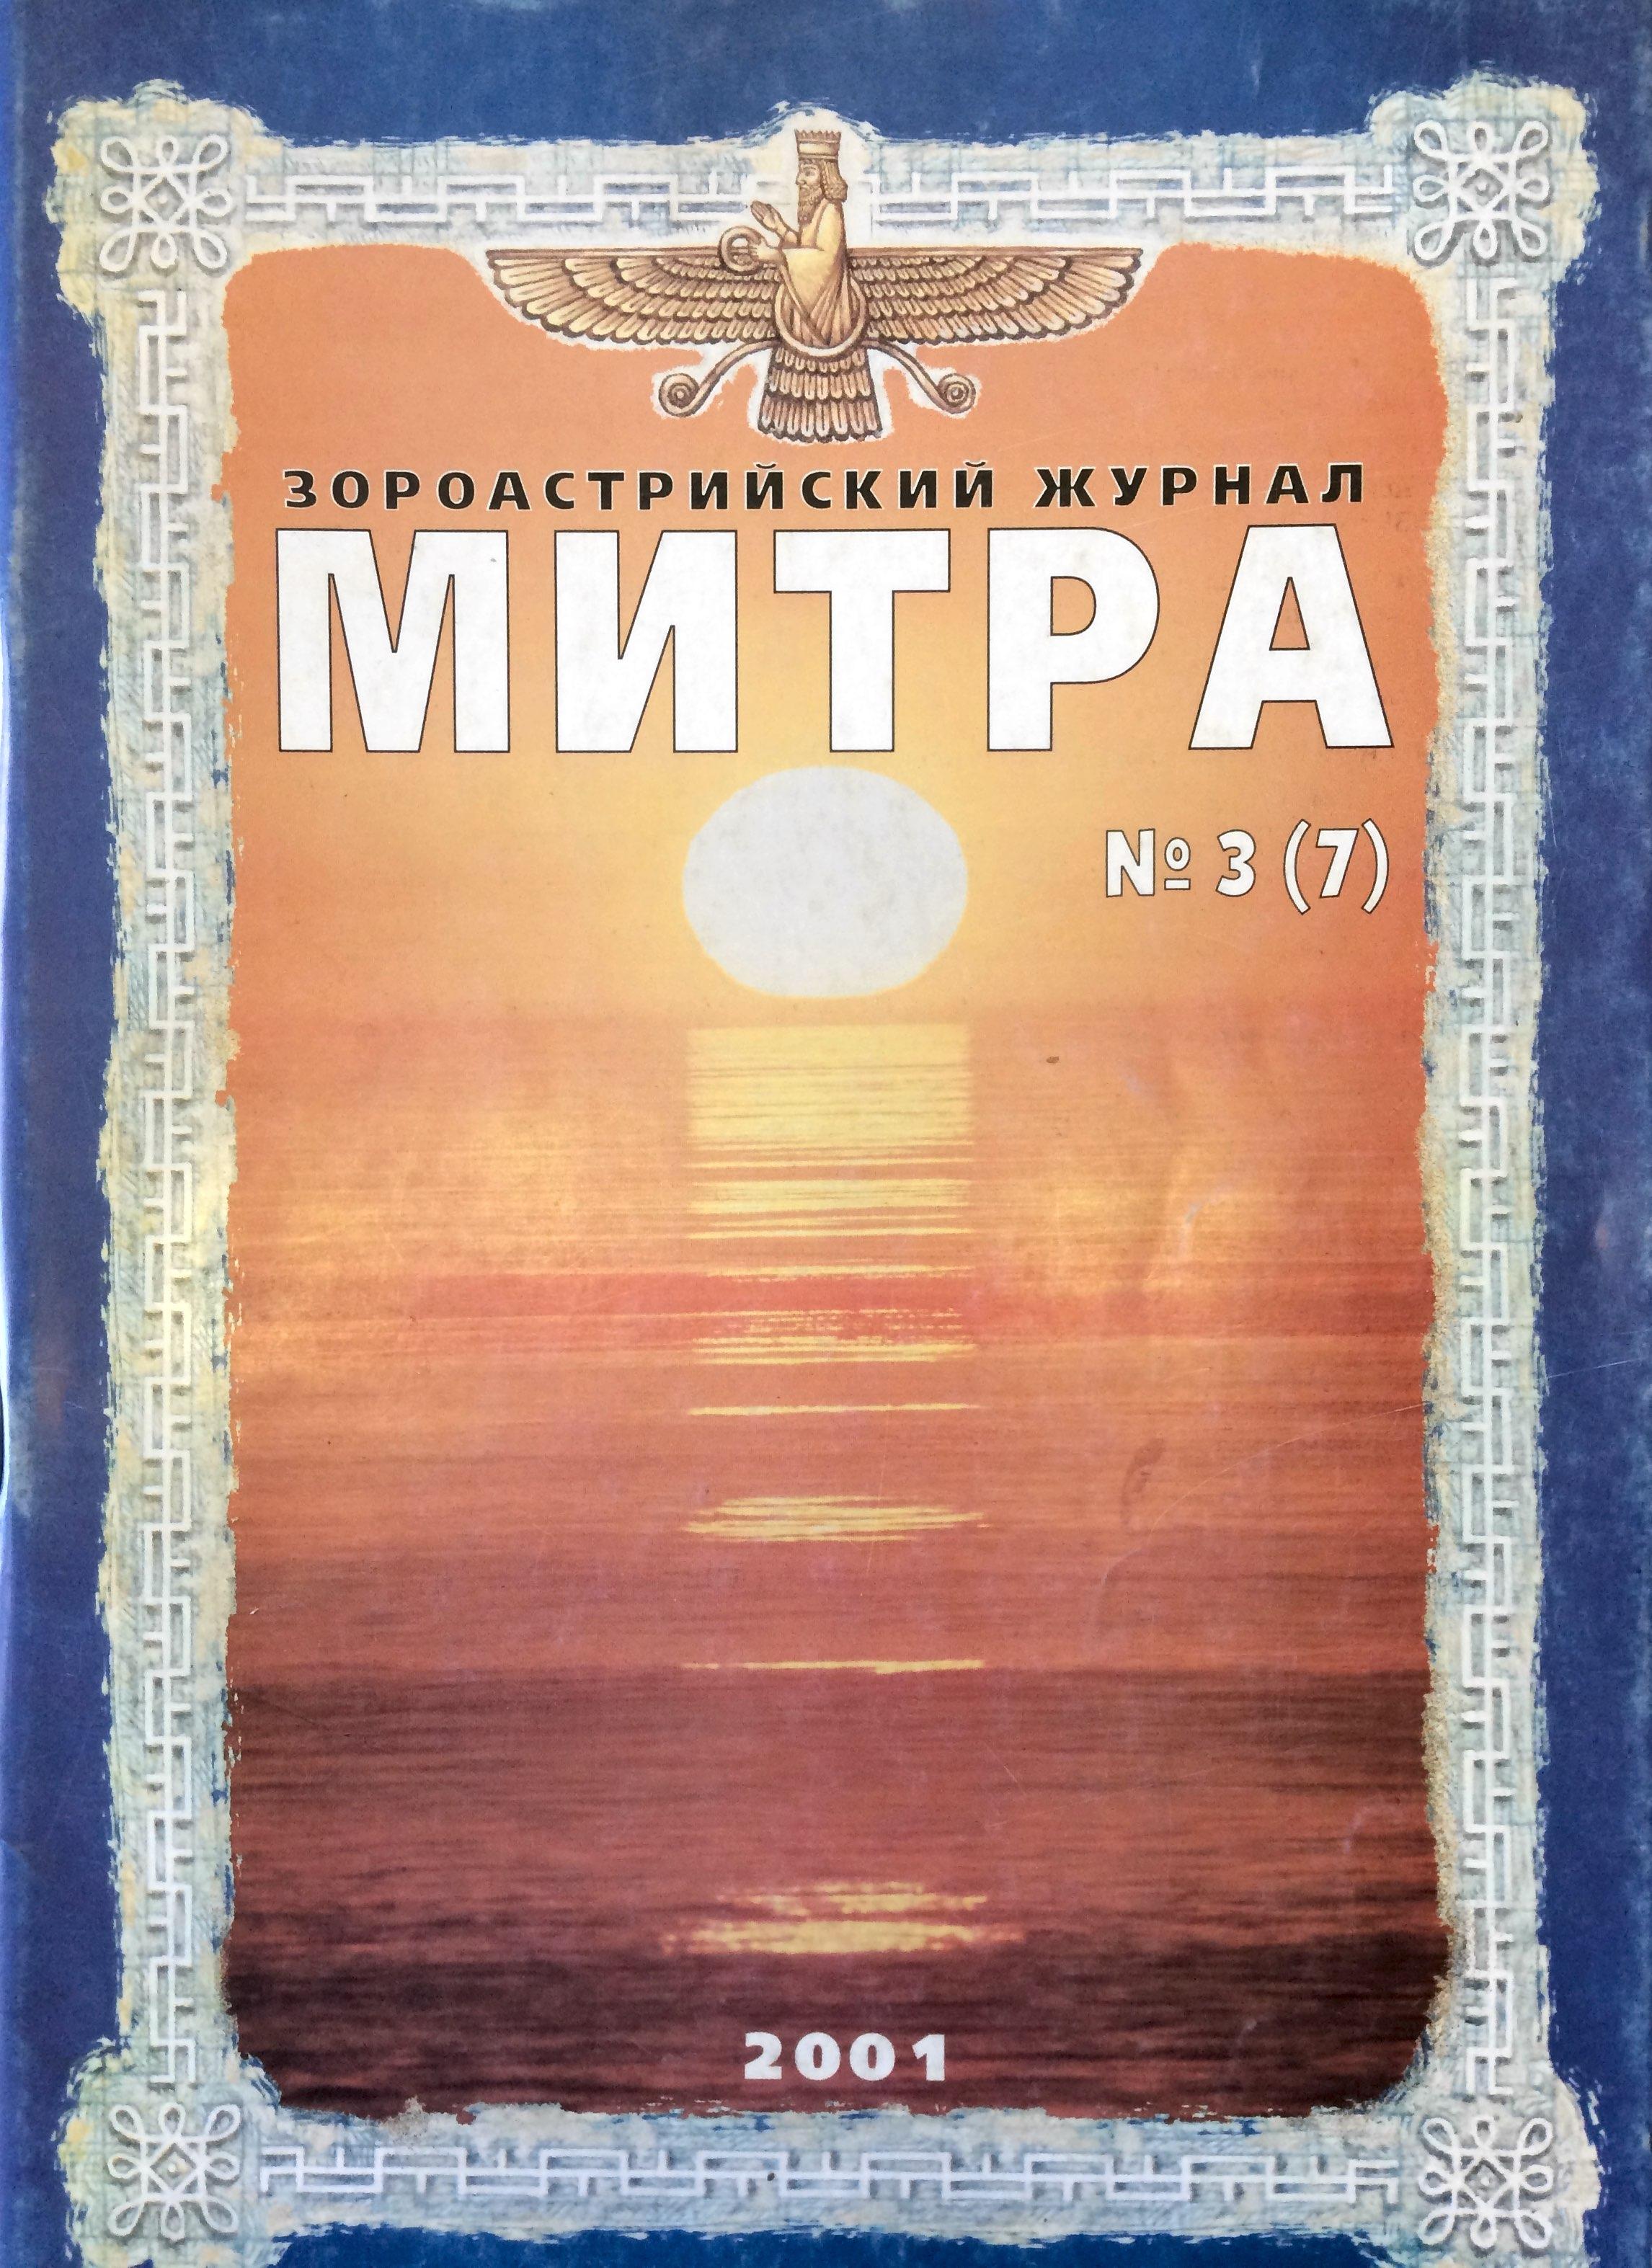 Mitra-03-07-2001